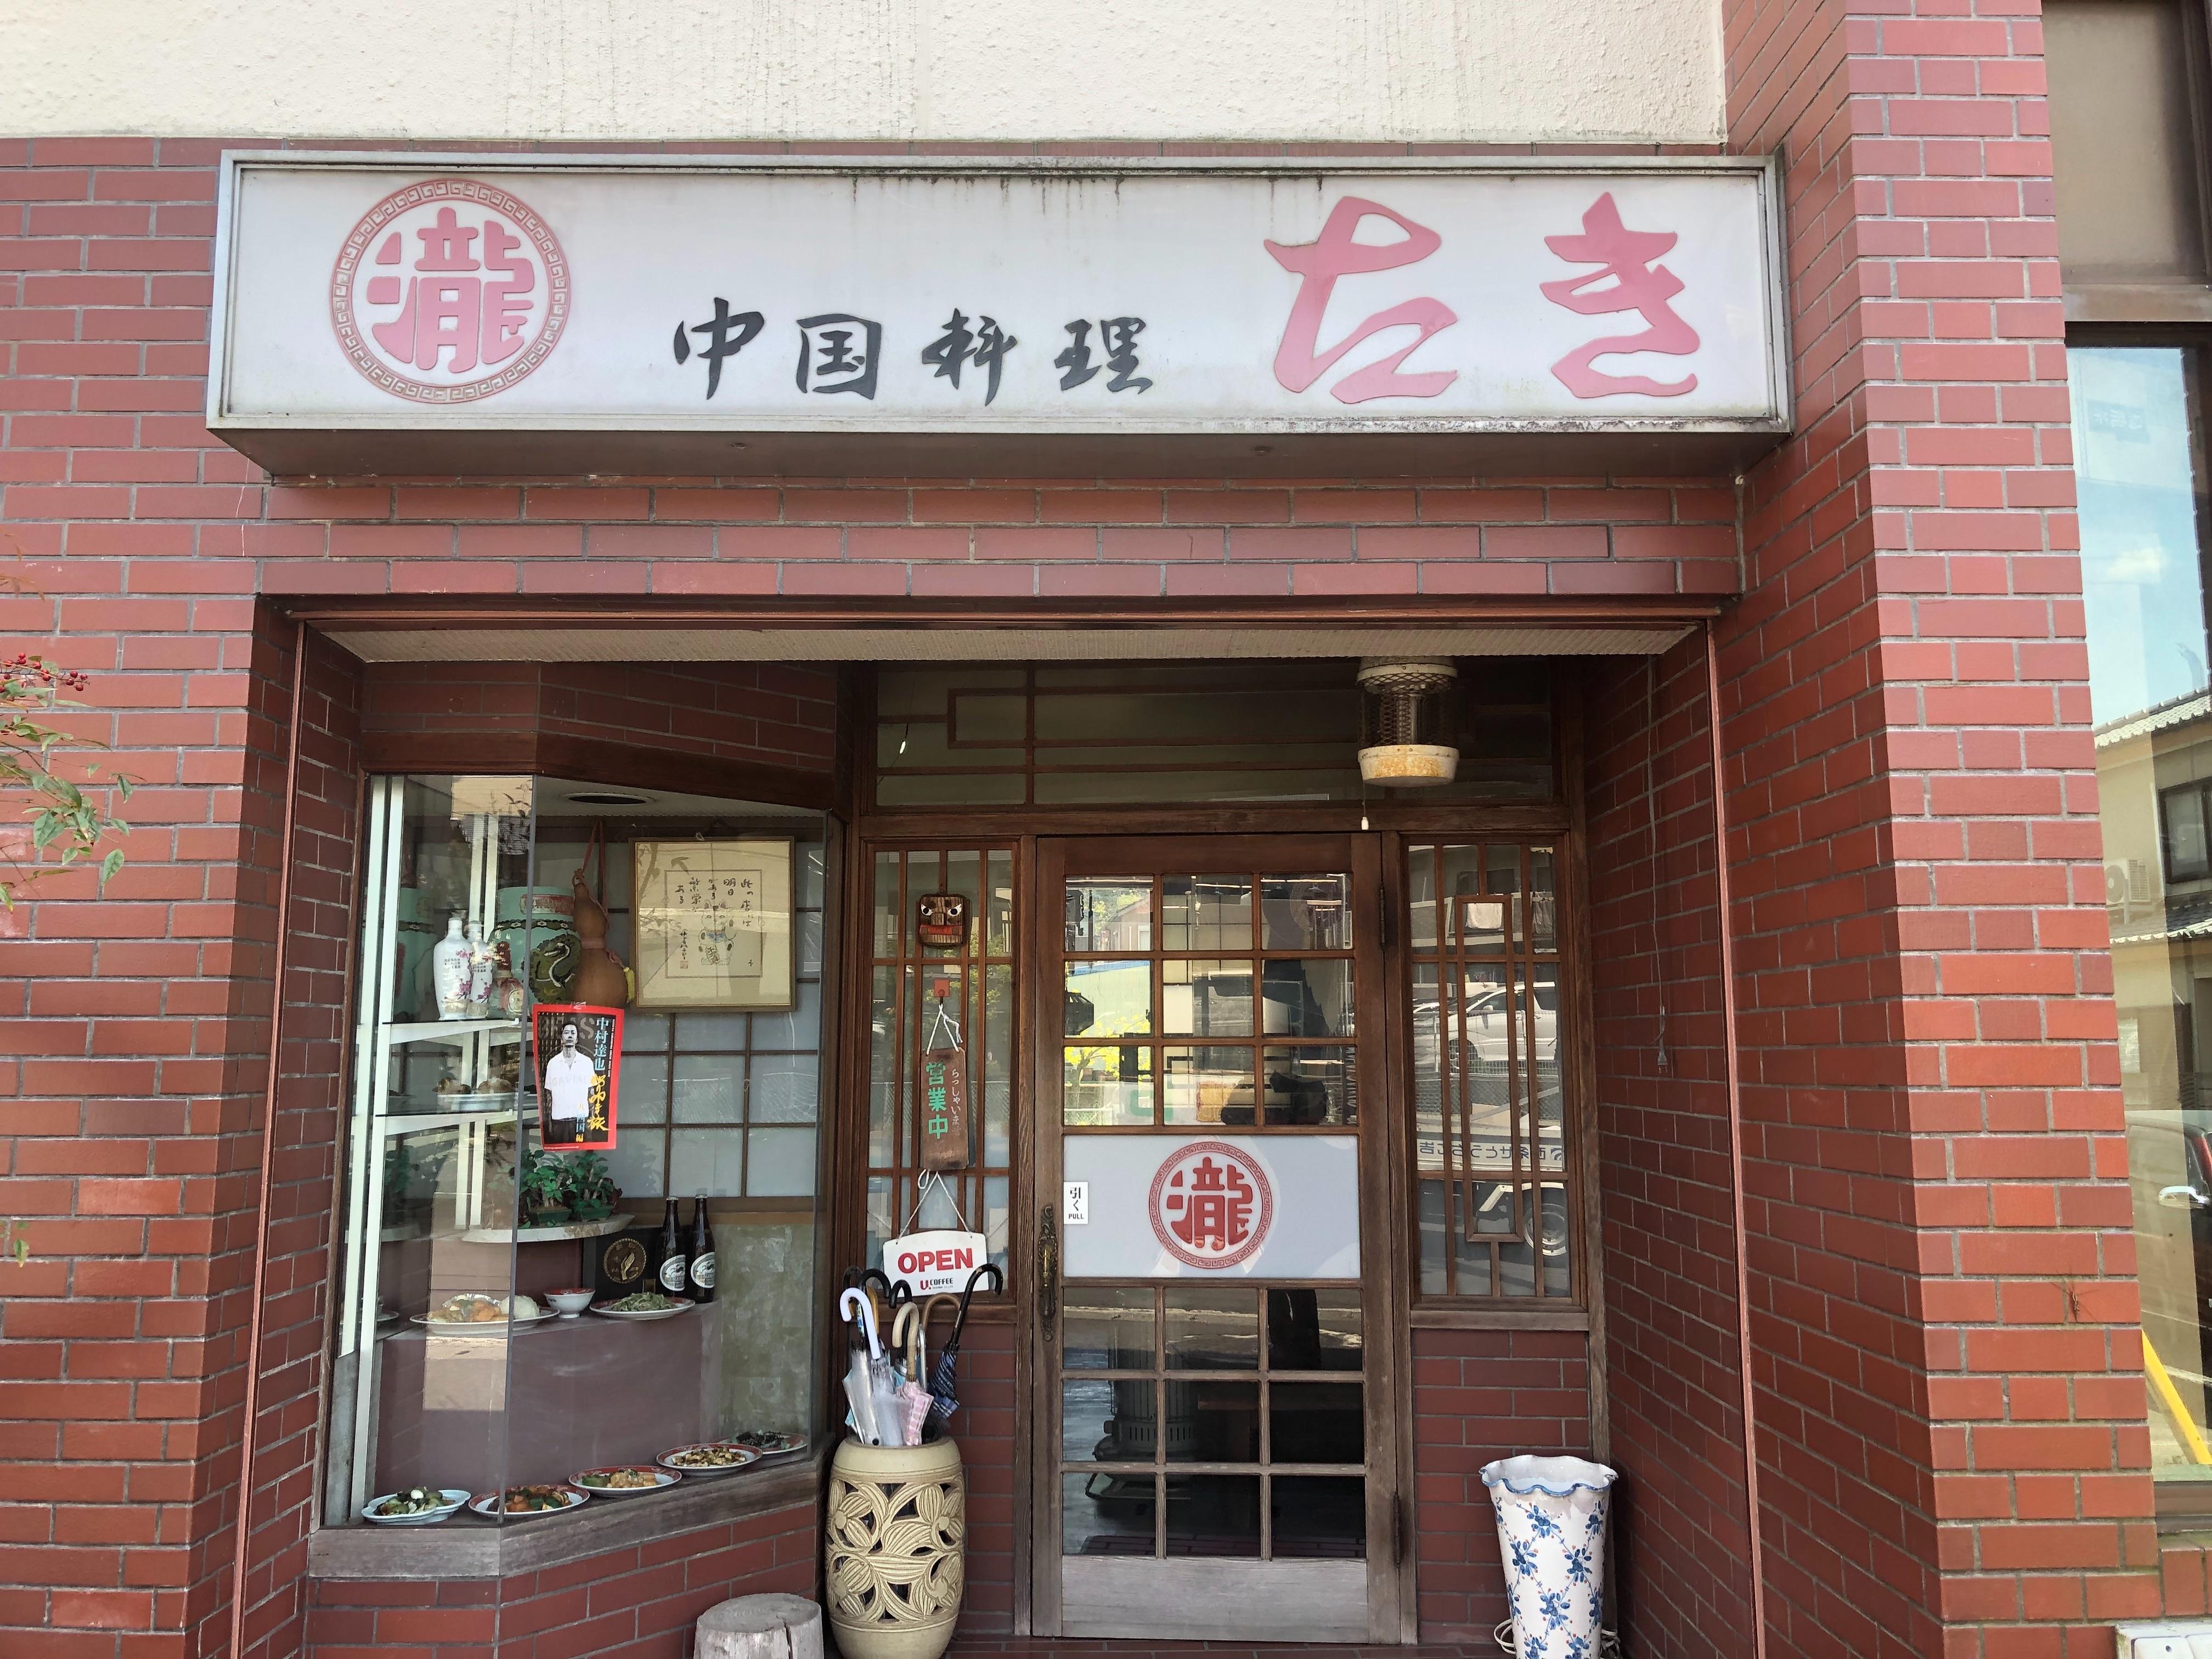 f:id:masanori-kato1972:20190419173845j:image